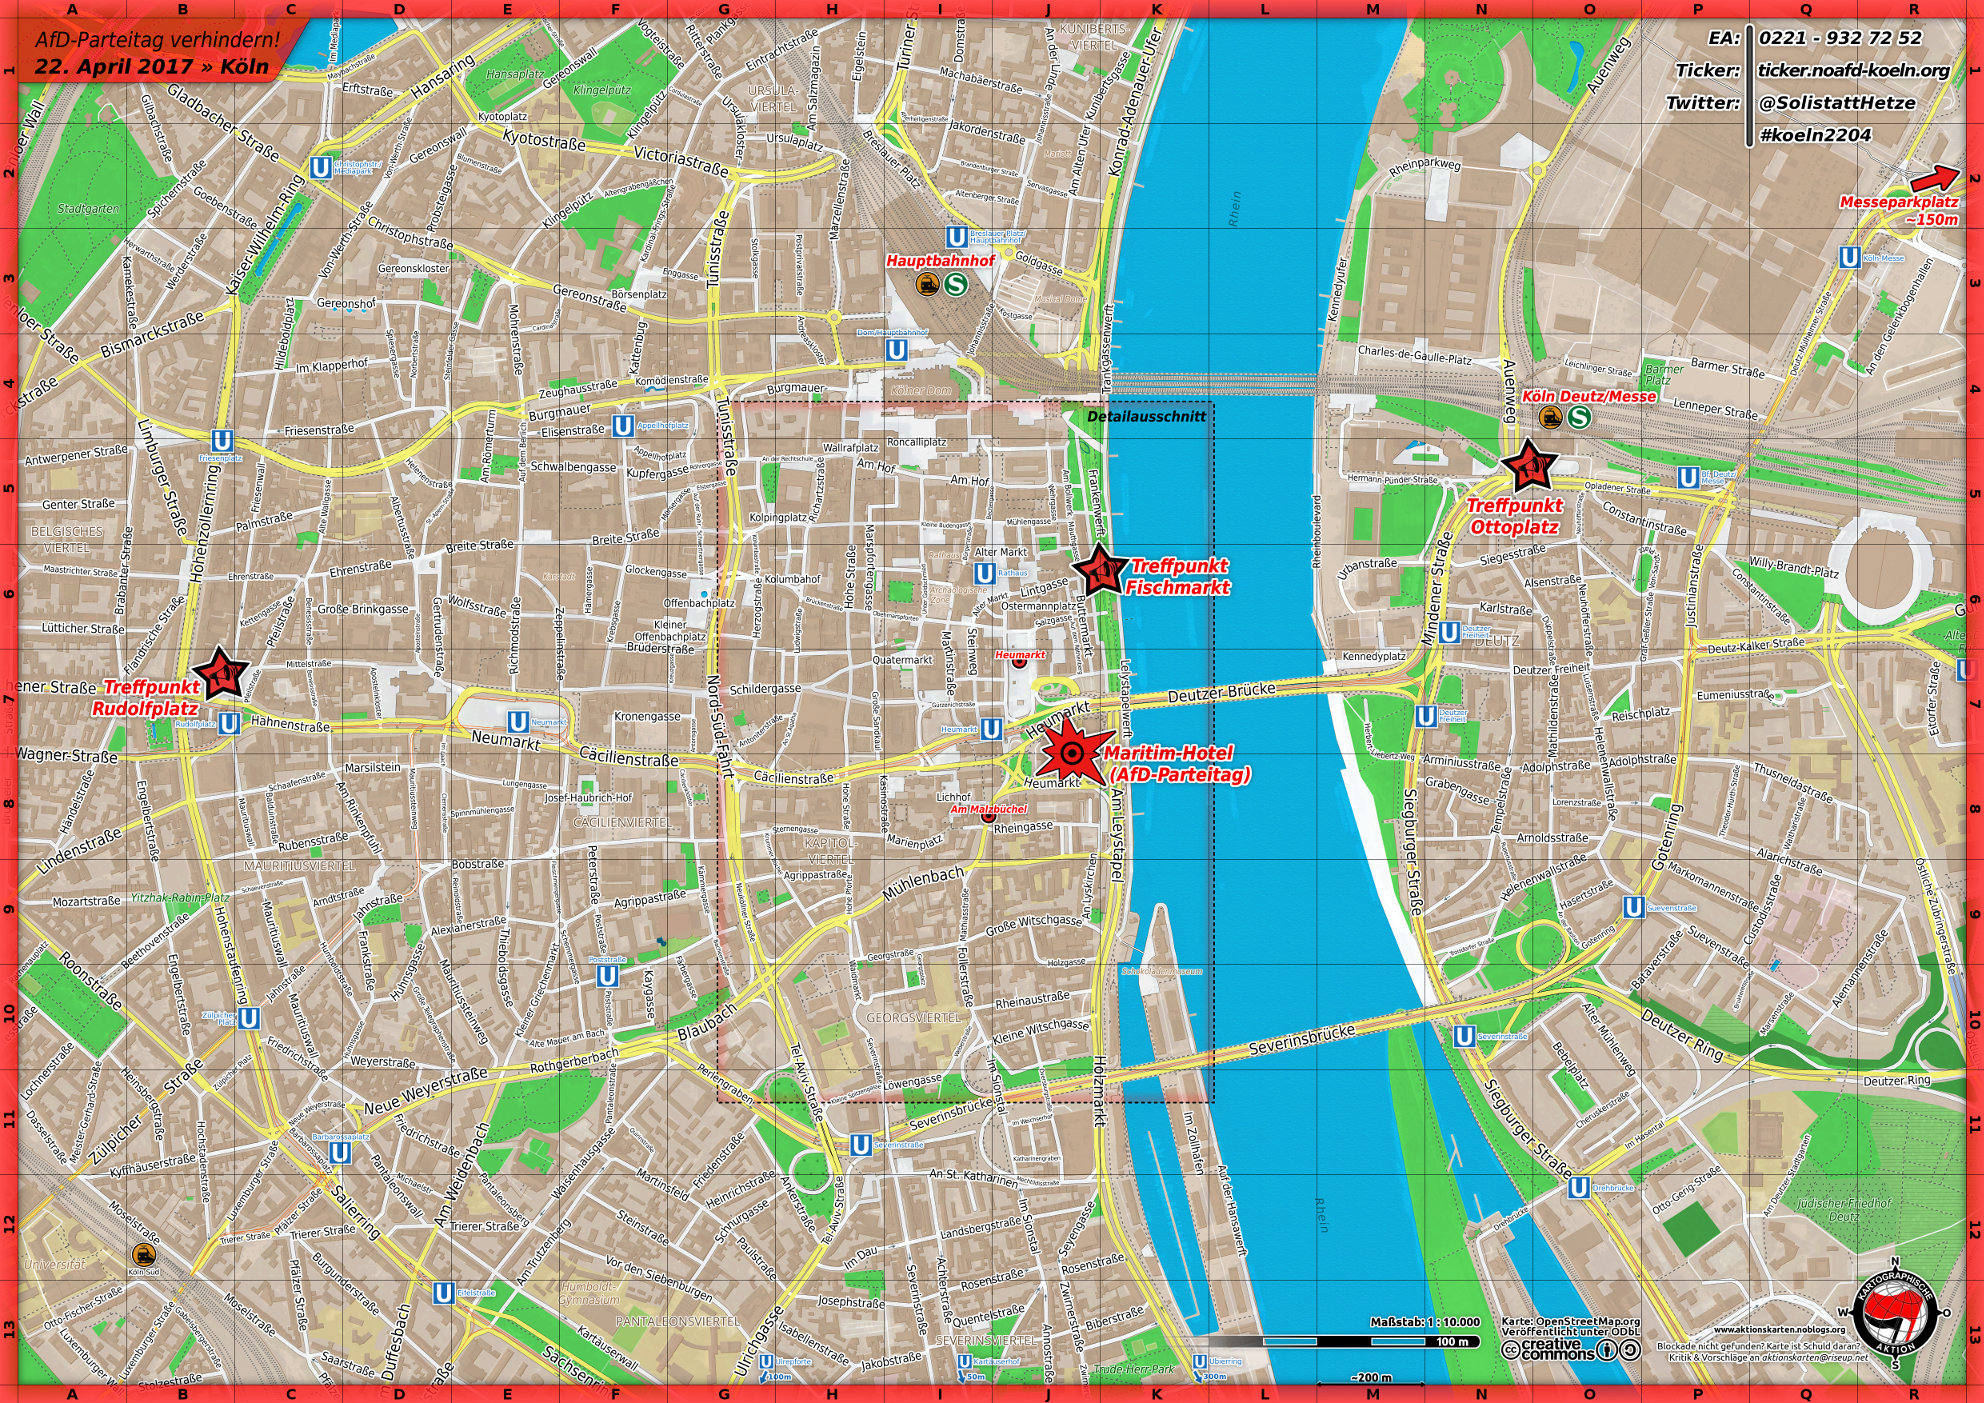 Köln 2017 Übersicht